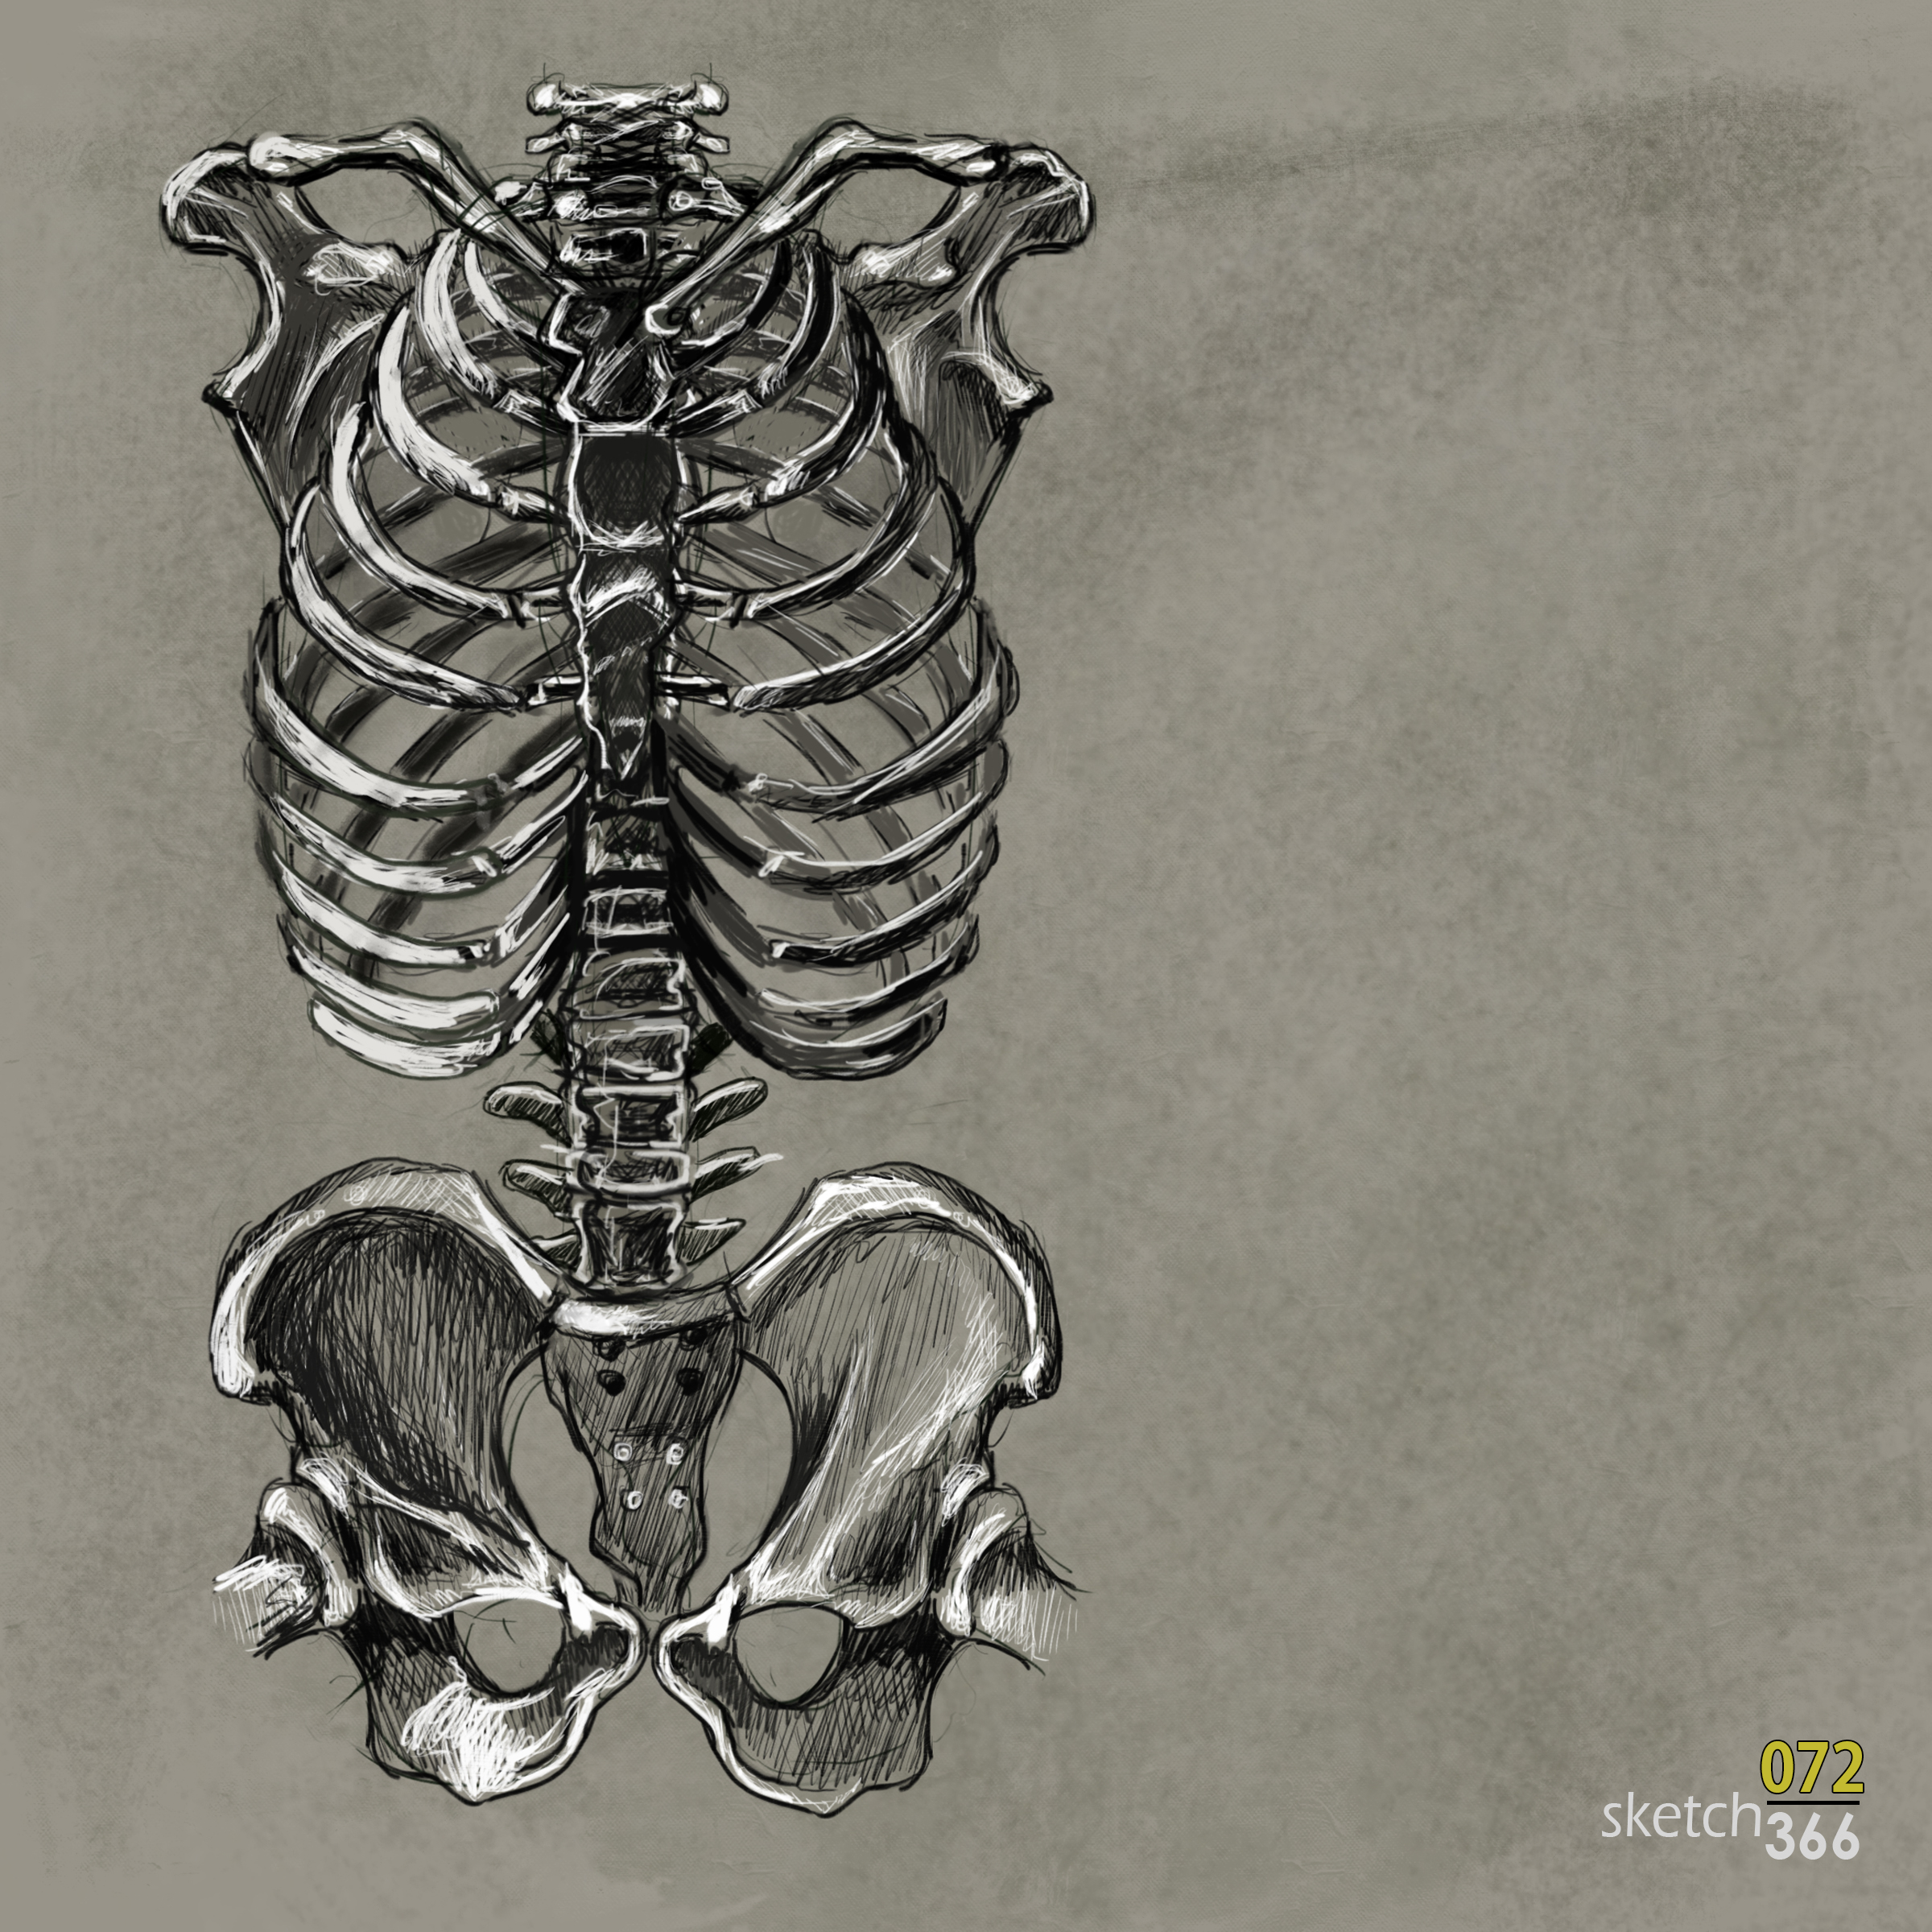 skeleton - digital pencil